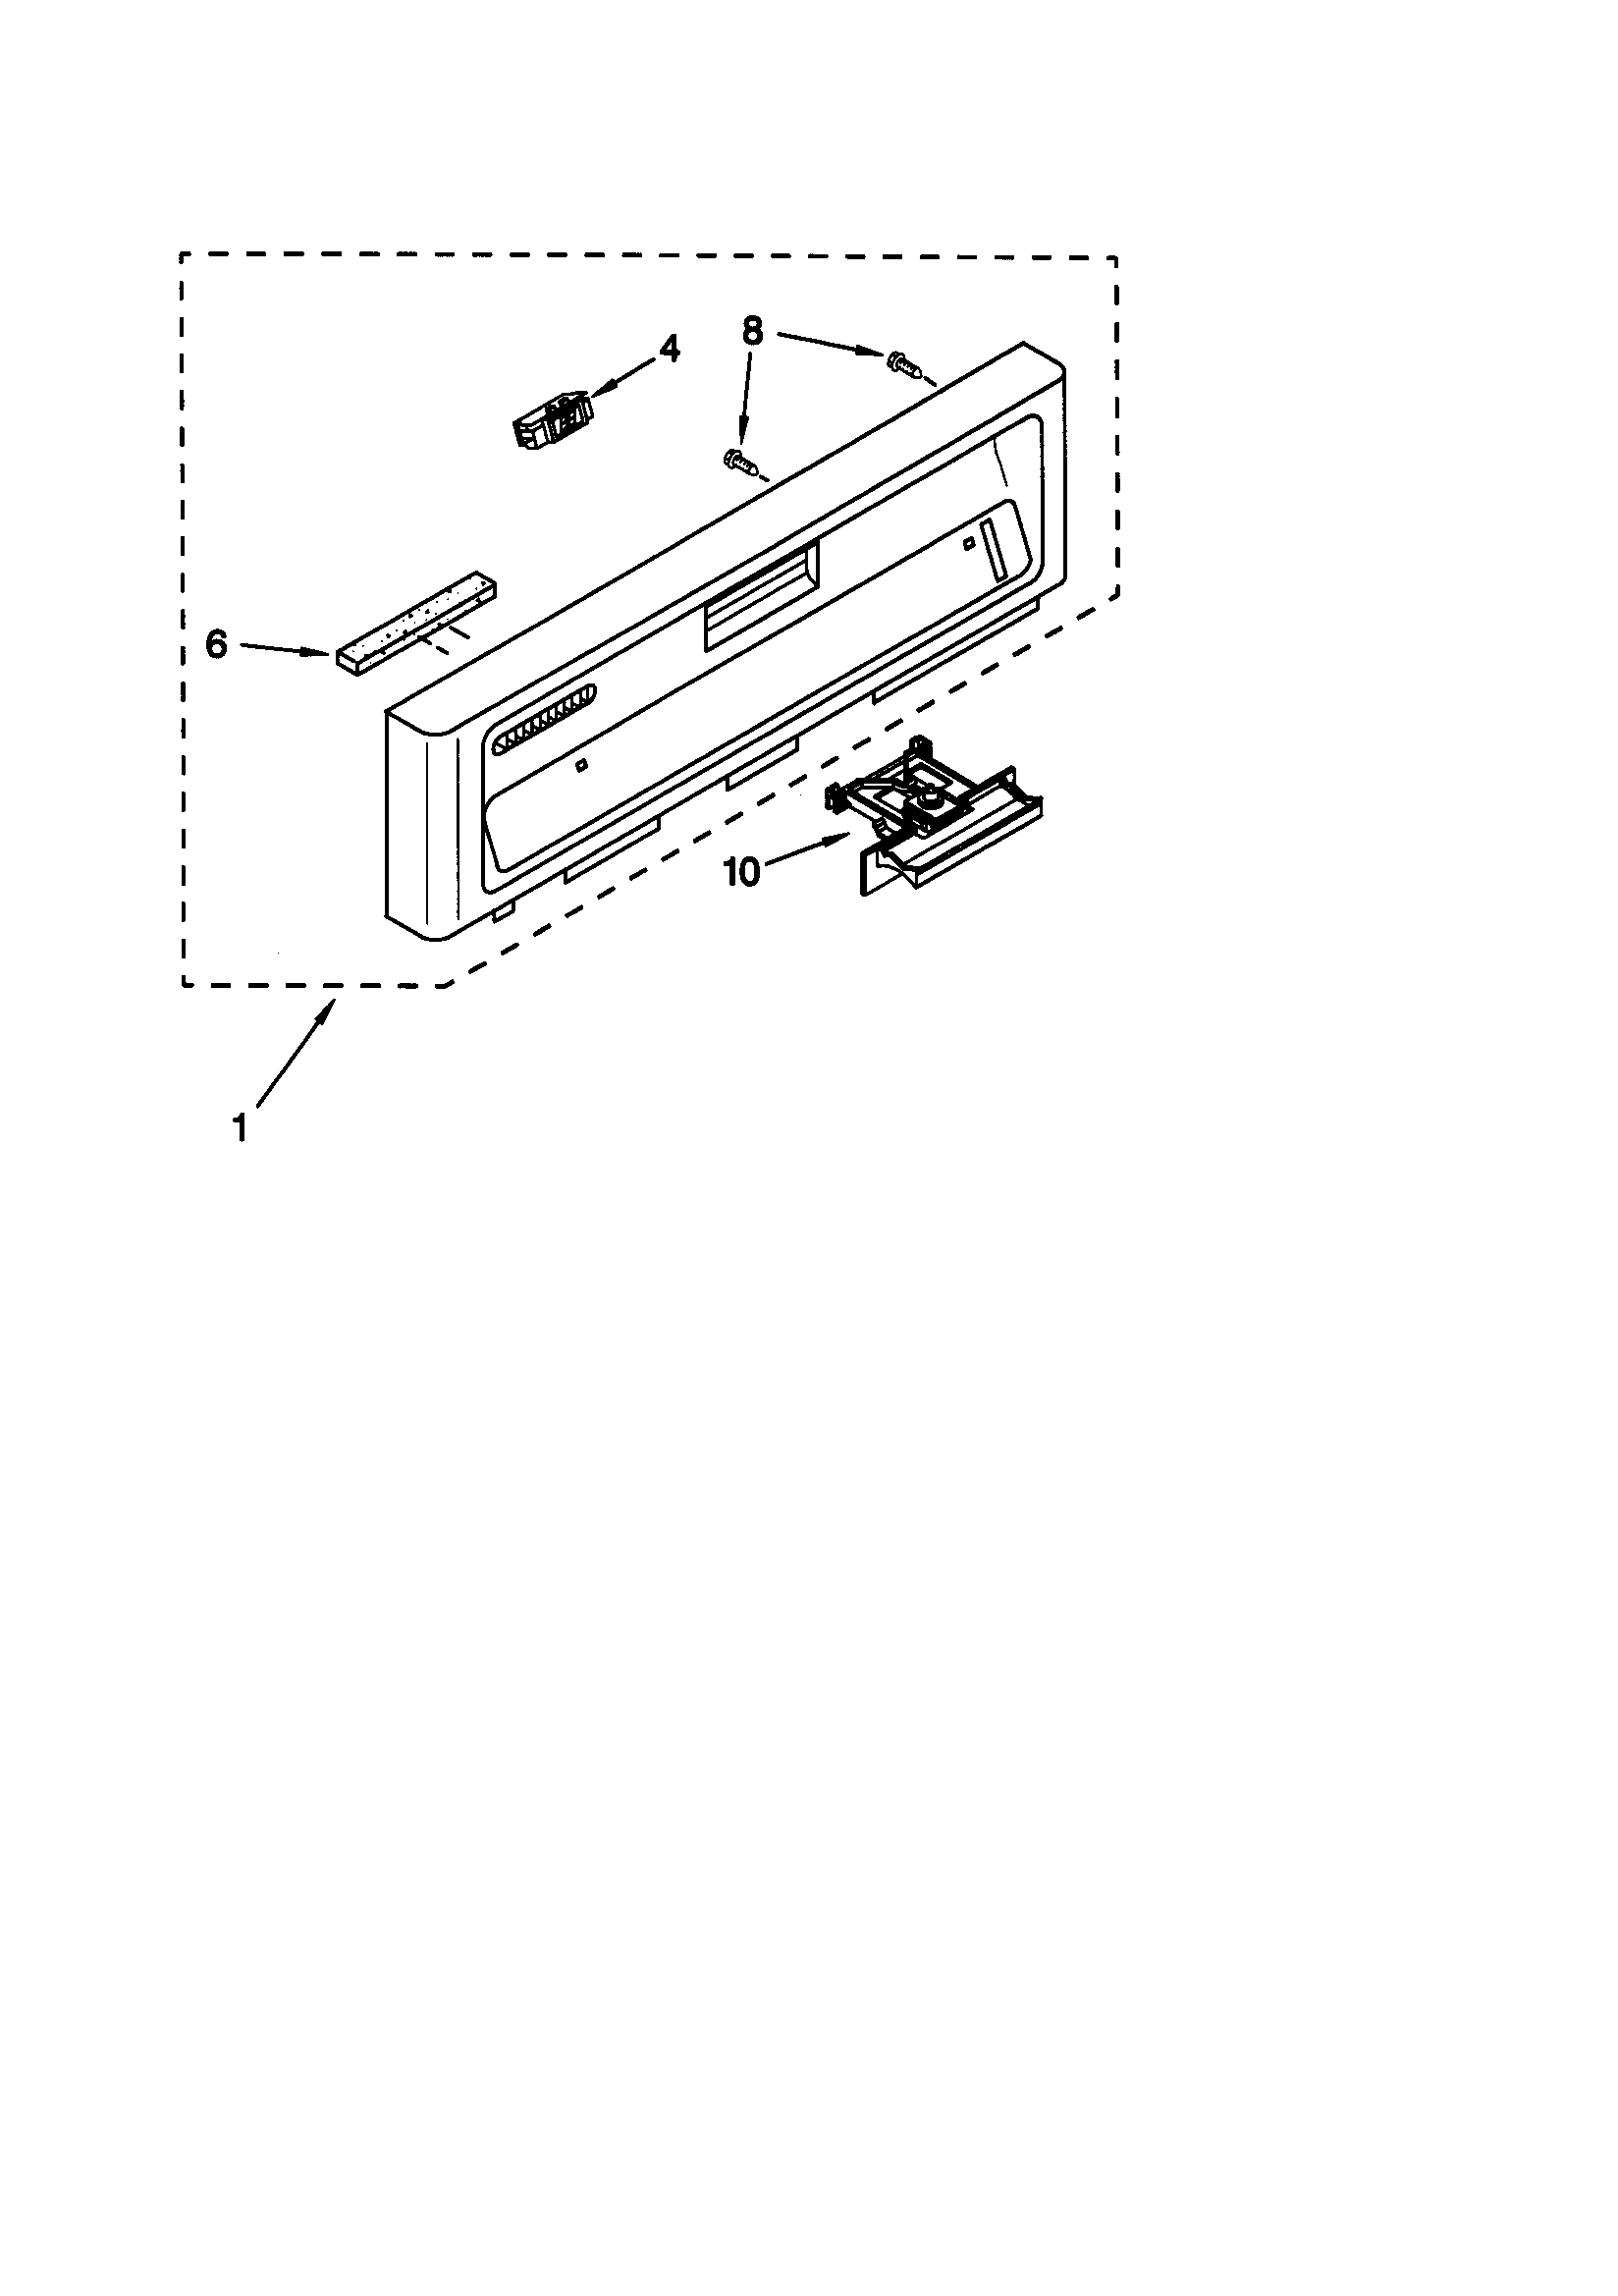 kenmore elite dishwasher wiring diagram western golf cart 42 volt 66515982990 timer - stove clocks and appliance timers